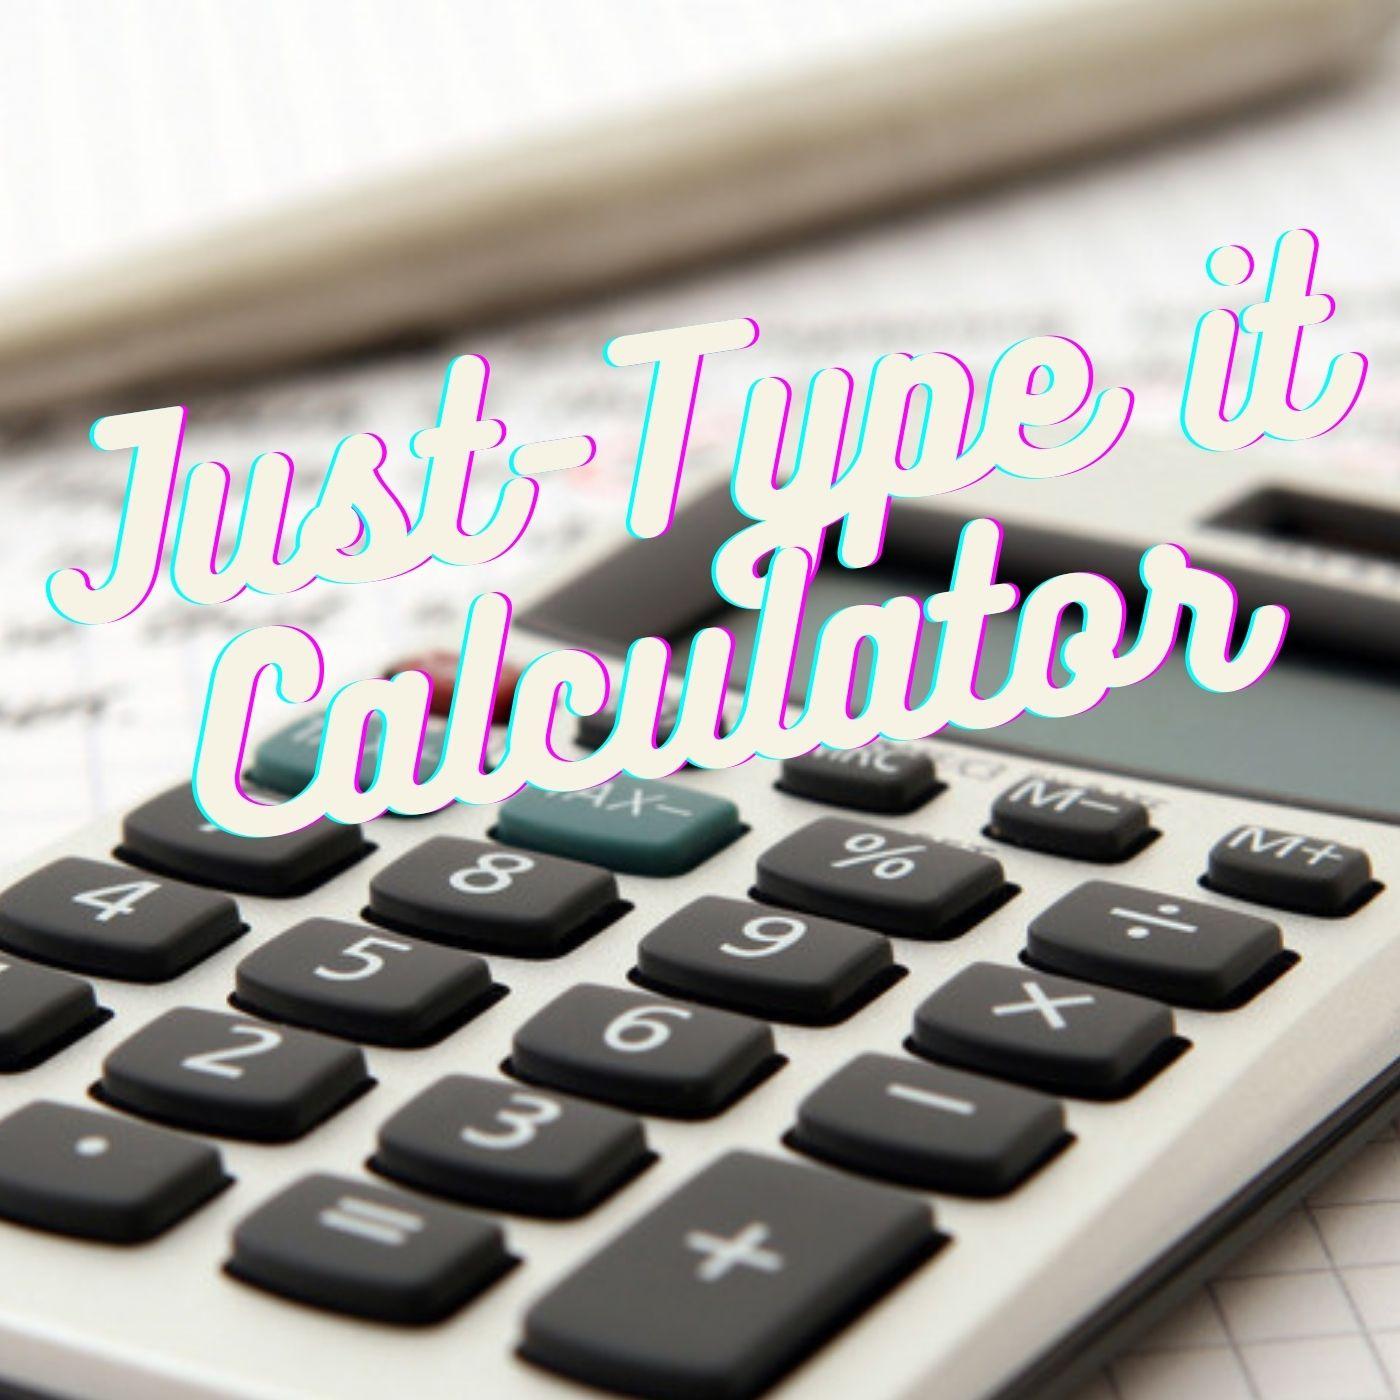 Just Type it Calculator